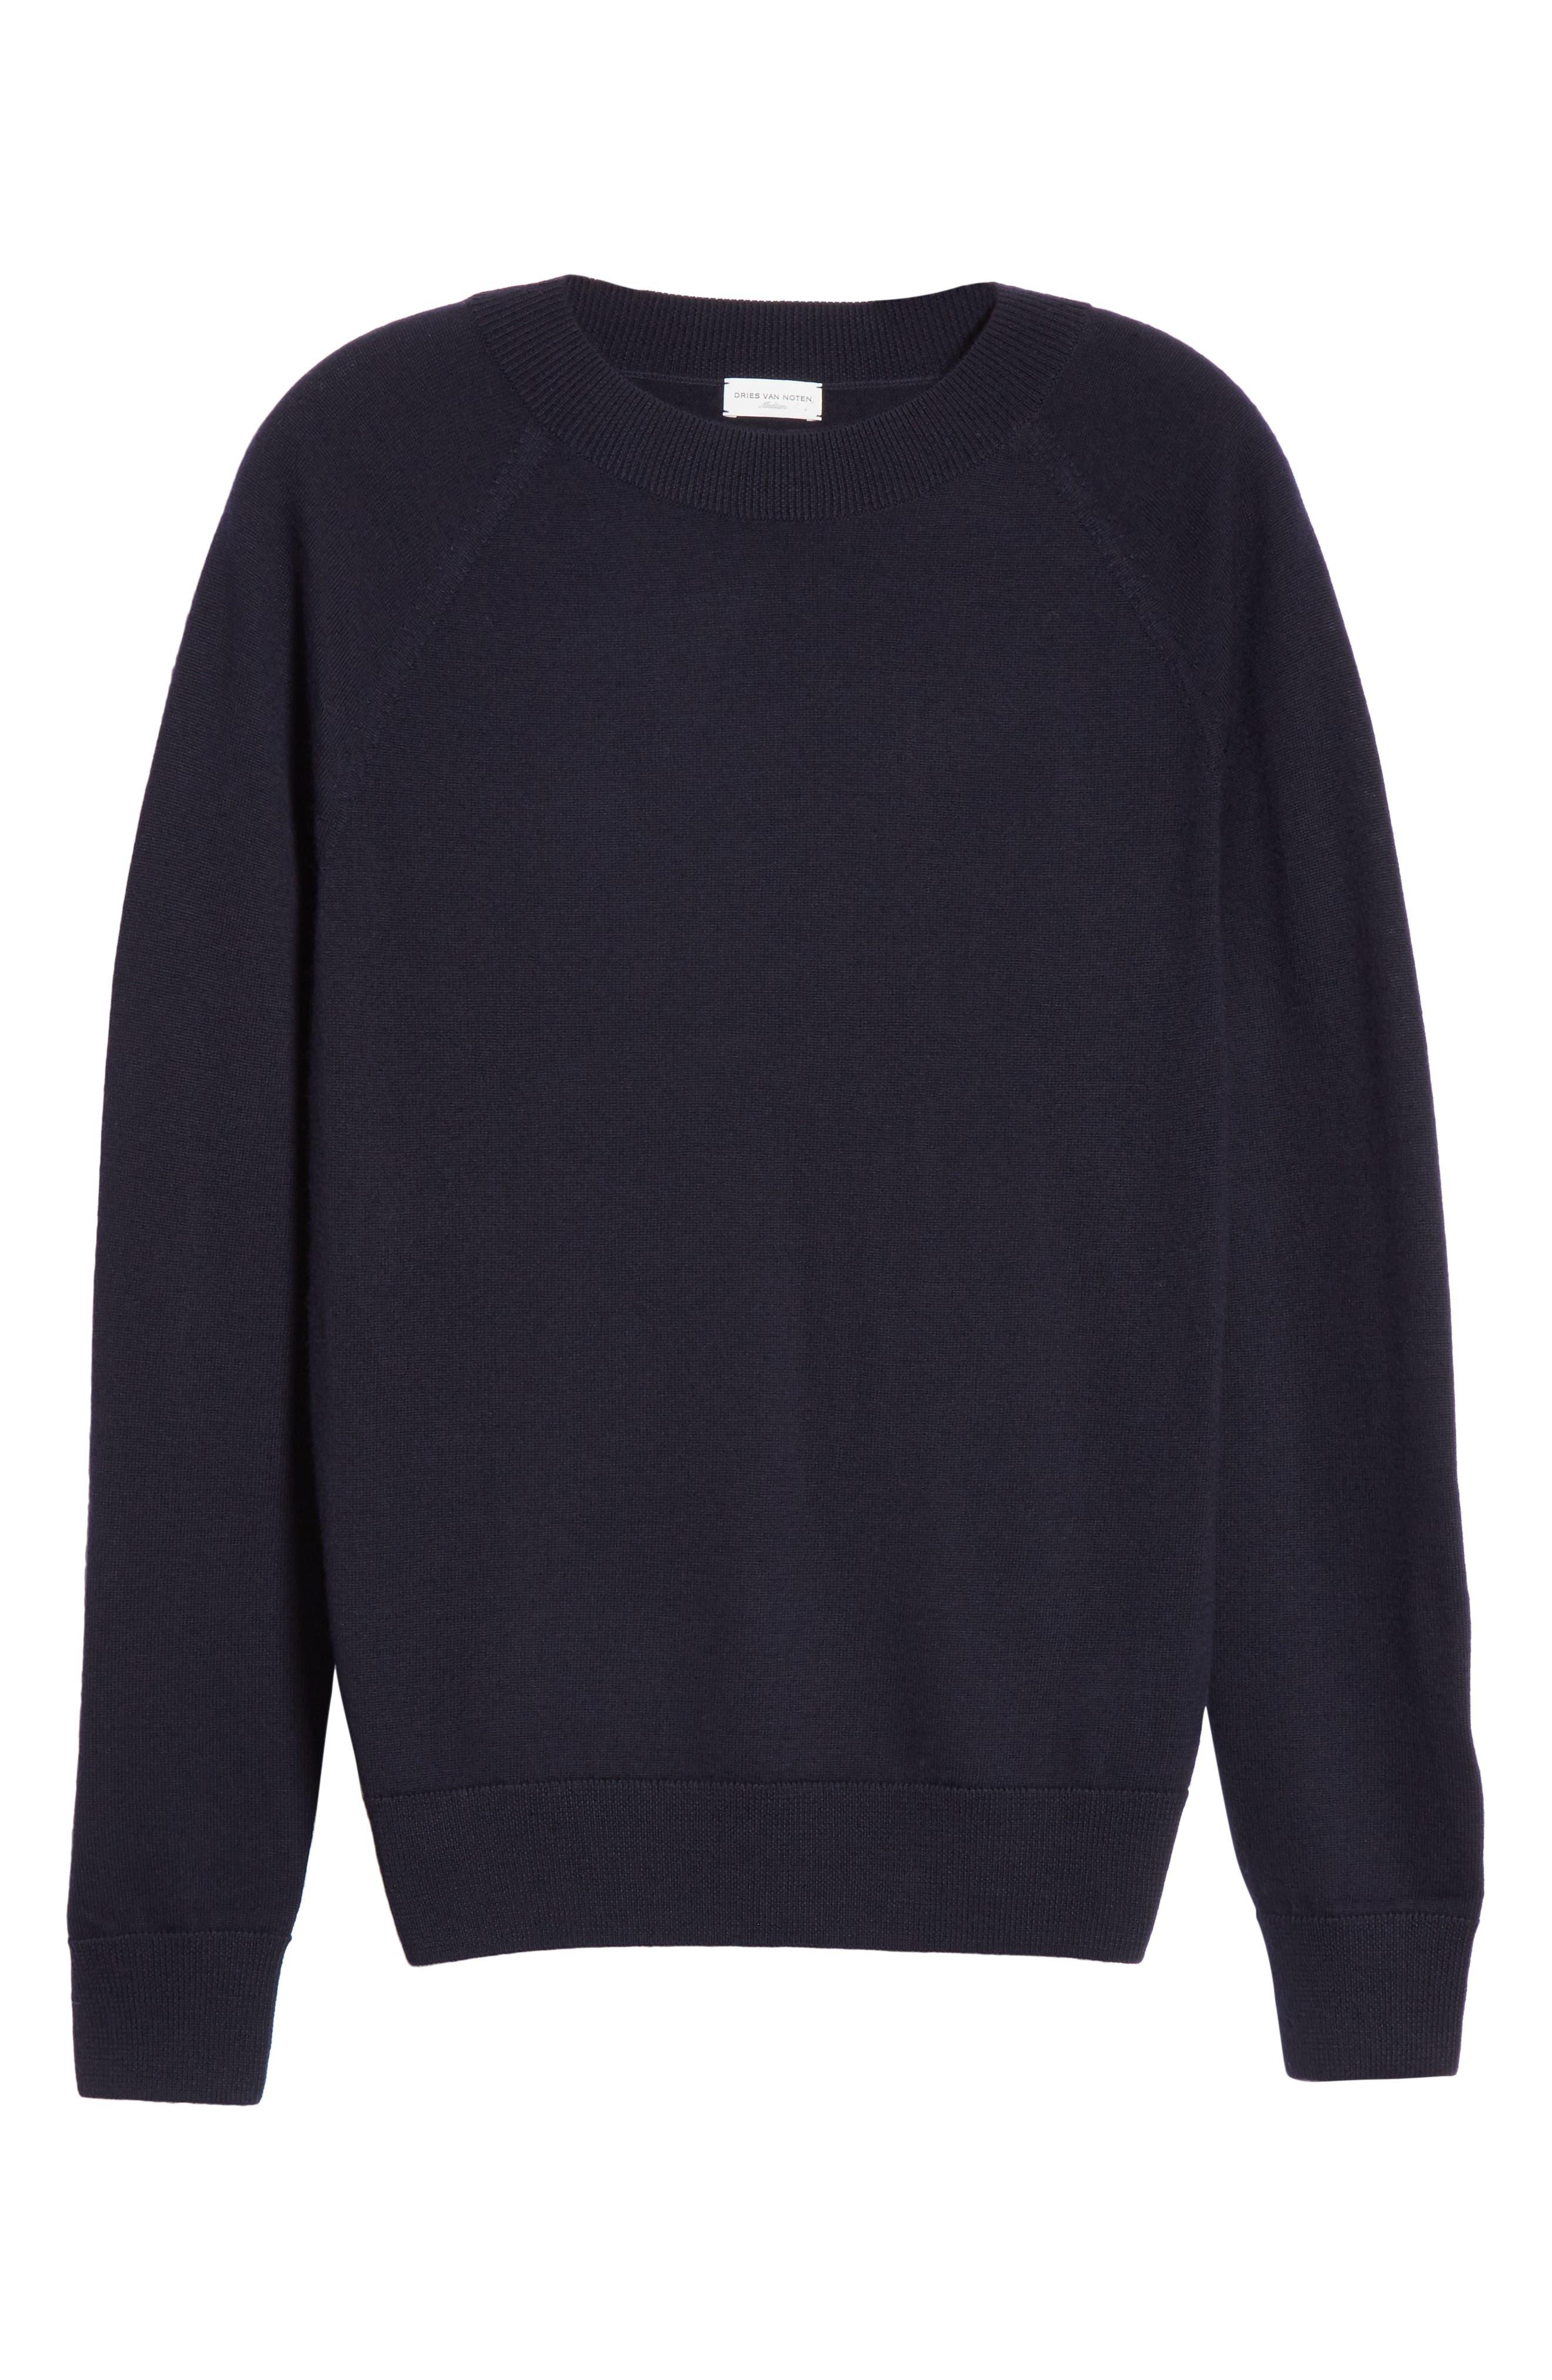 Mimic Raglan Sweater,                             Alternate thumbnail 6, color,                             NAVY